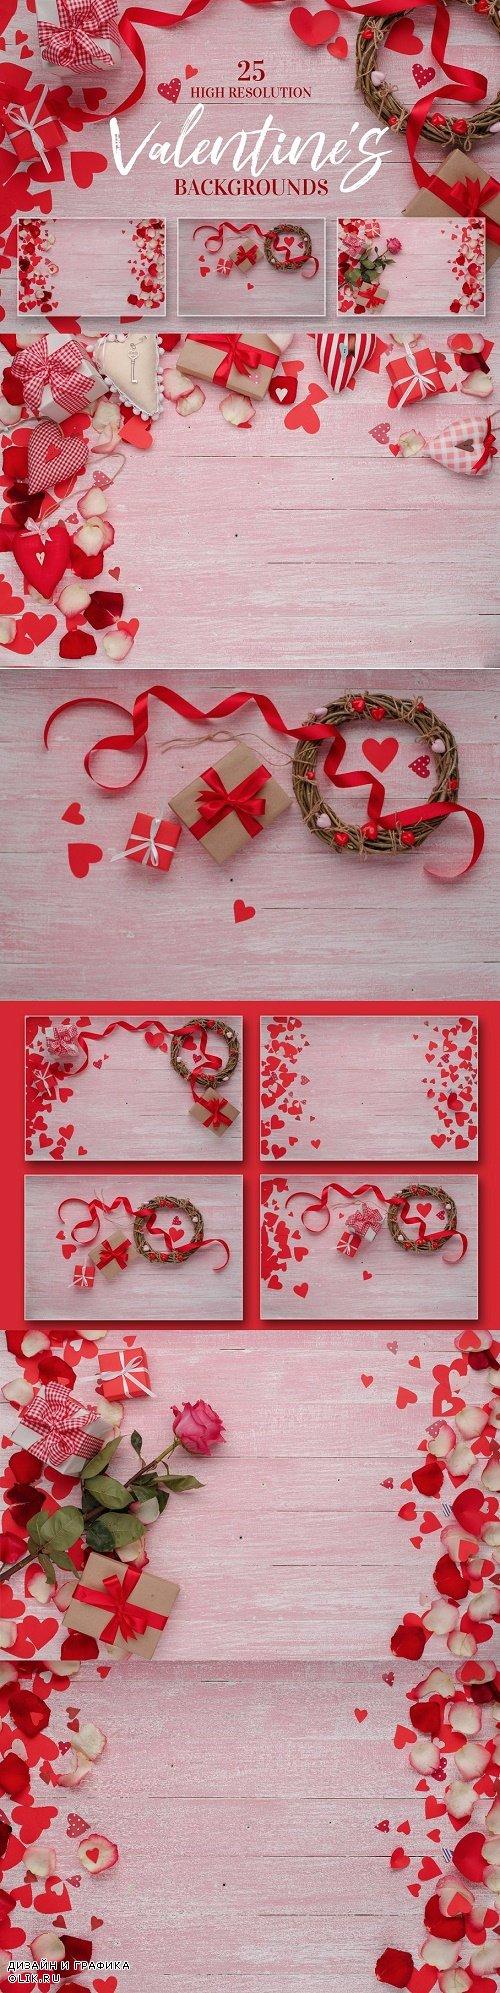 Valentines Day love celebration JPG - 4283132